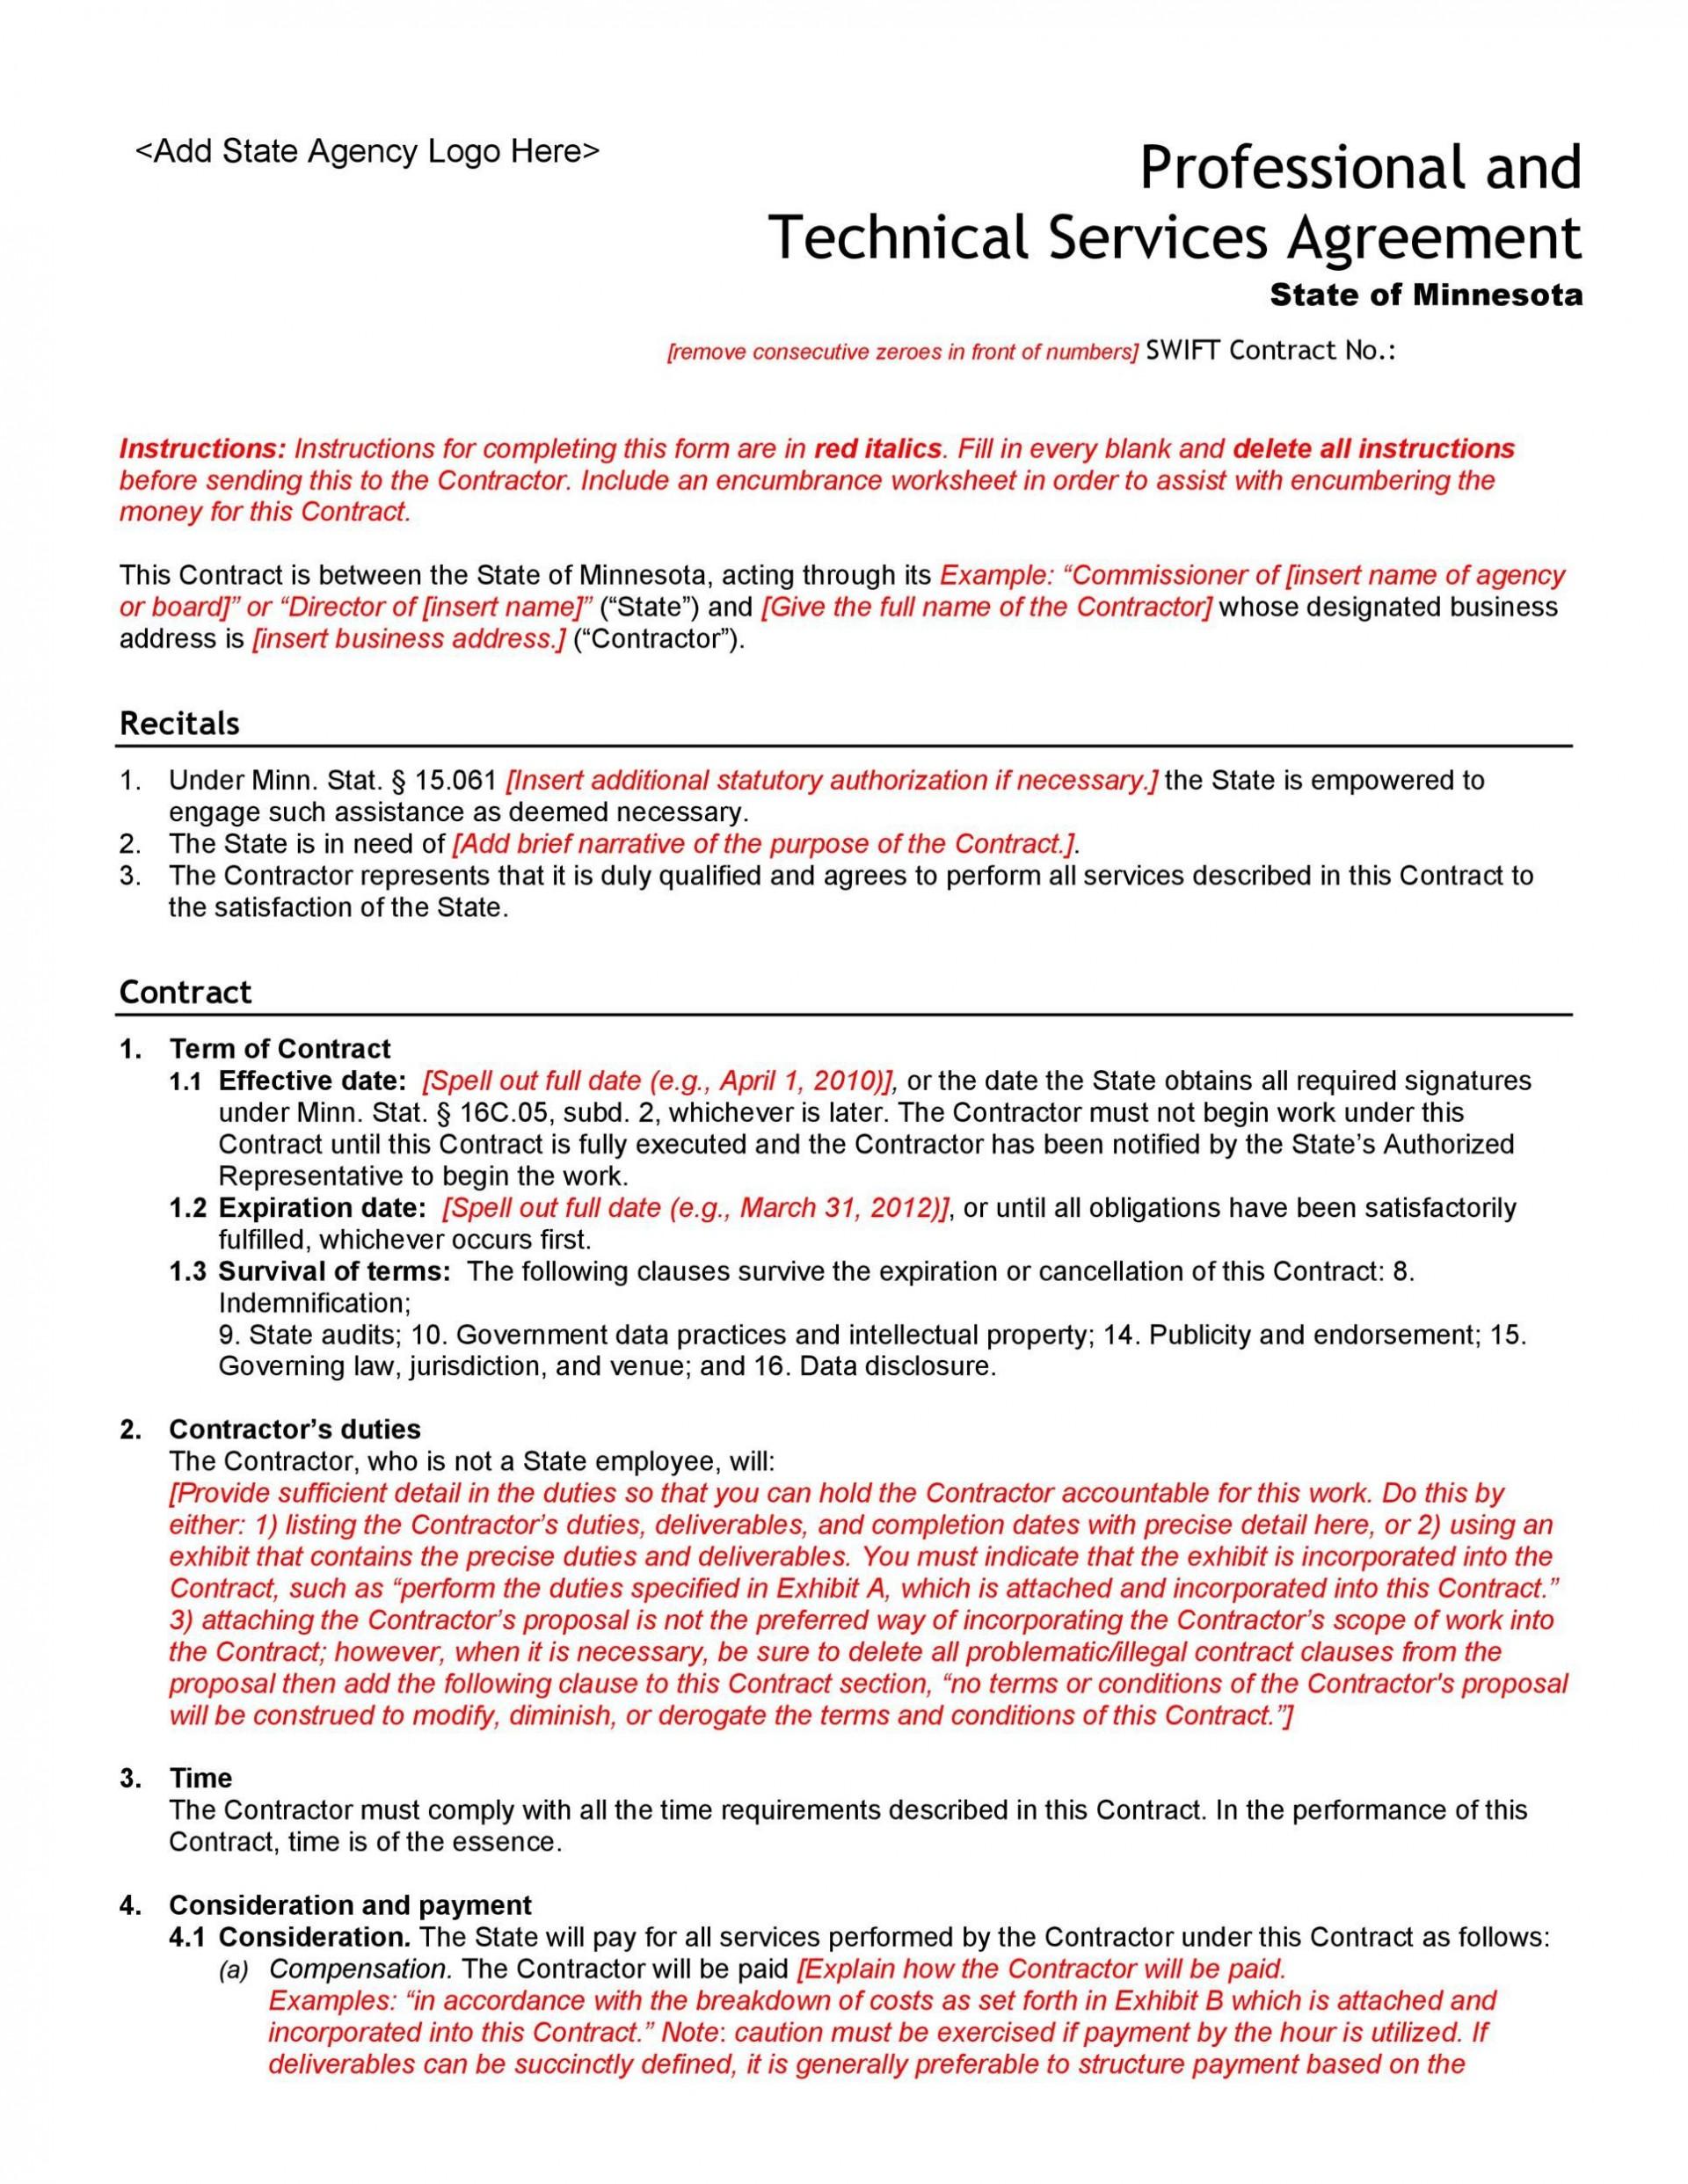 007 Stupendou Master Service Agreement Template Inspiration  Marketing For Software Development1920